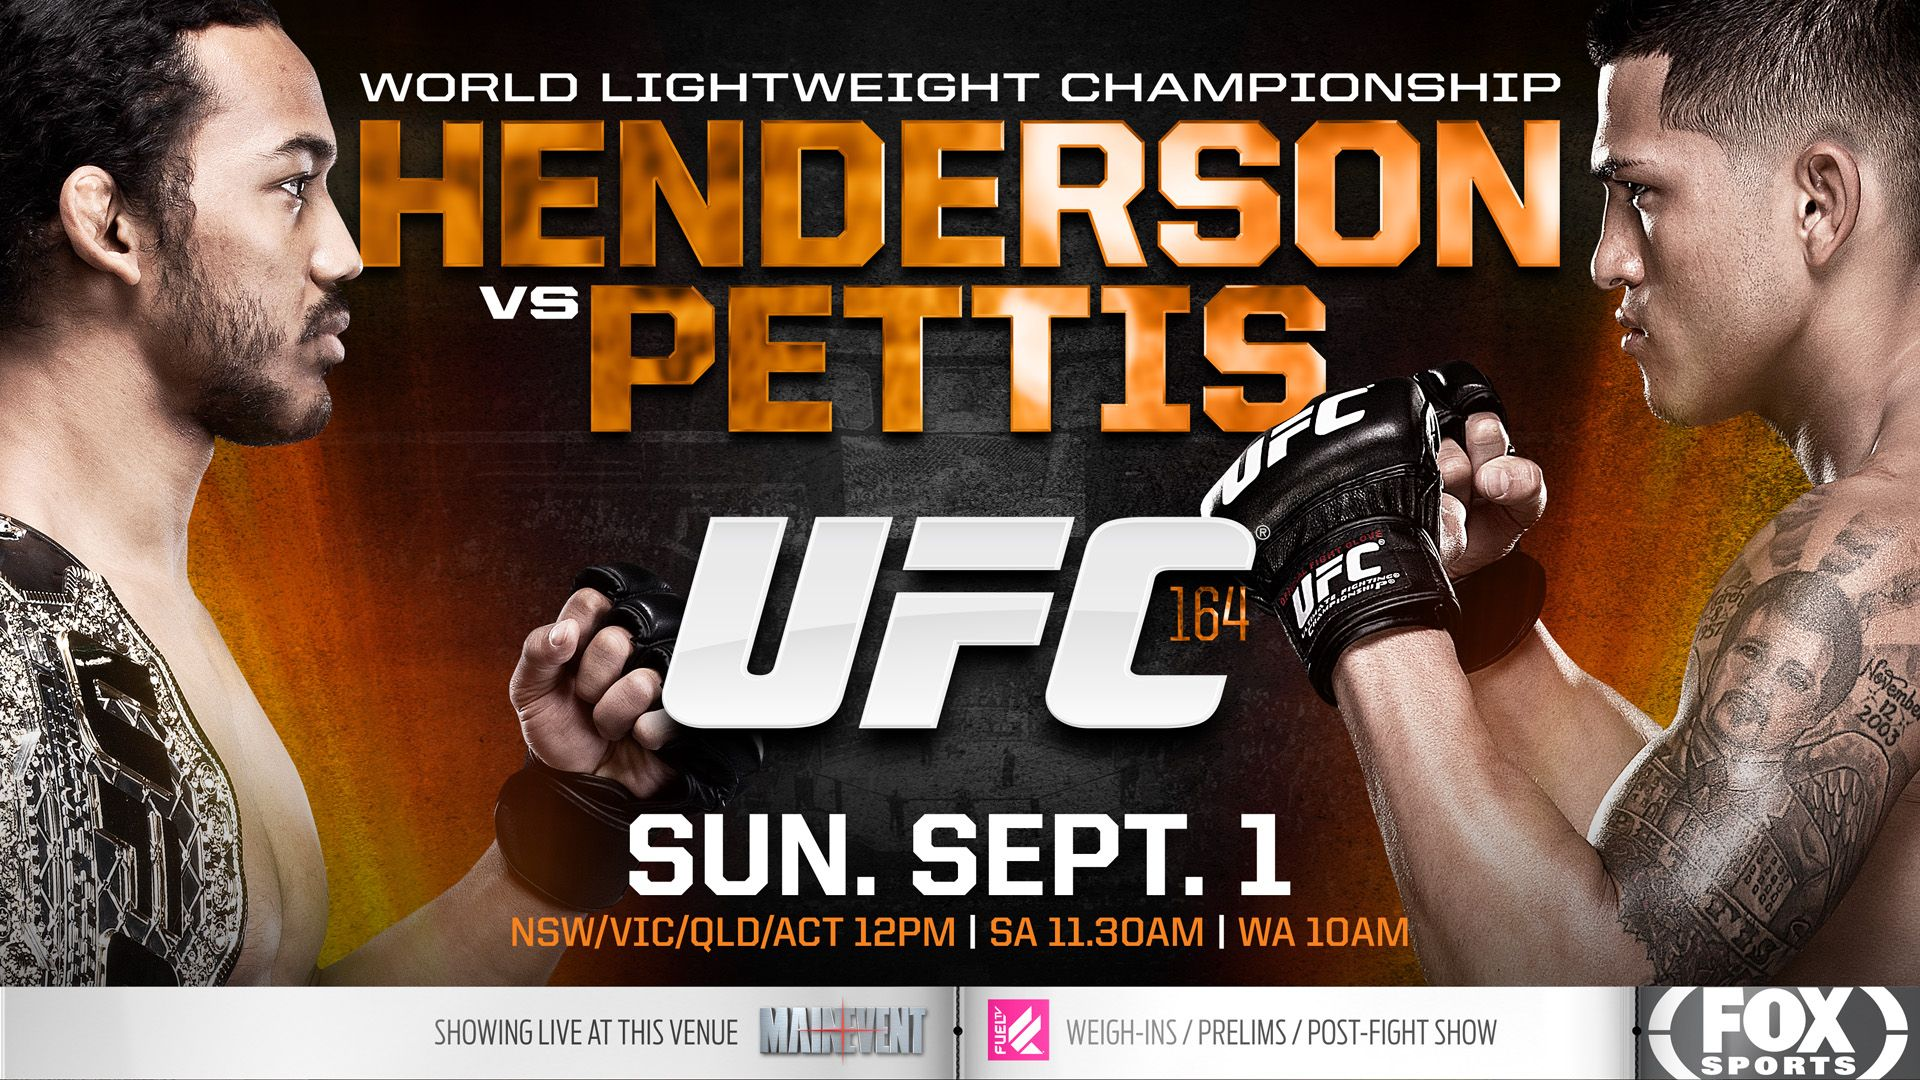 Wallpaper for UFC 164 Ufc, Ufc boxing, Full show